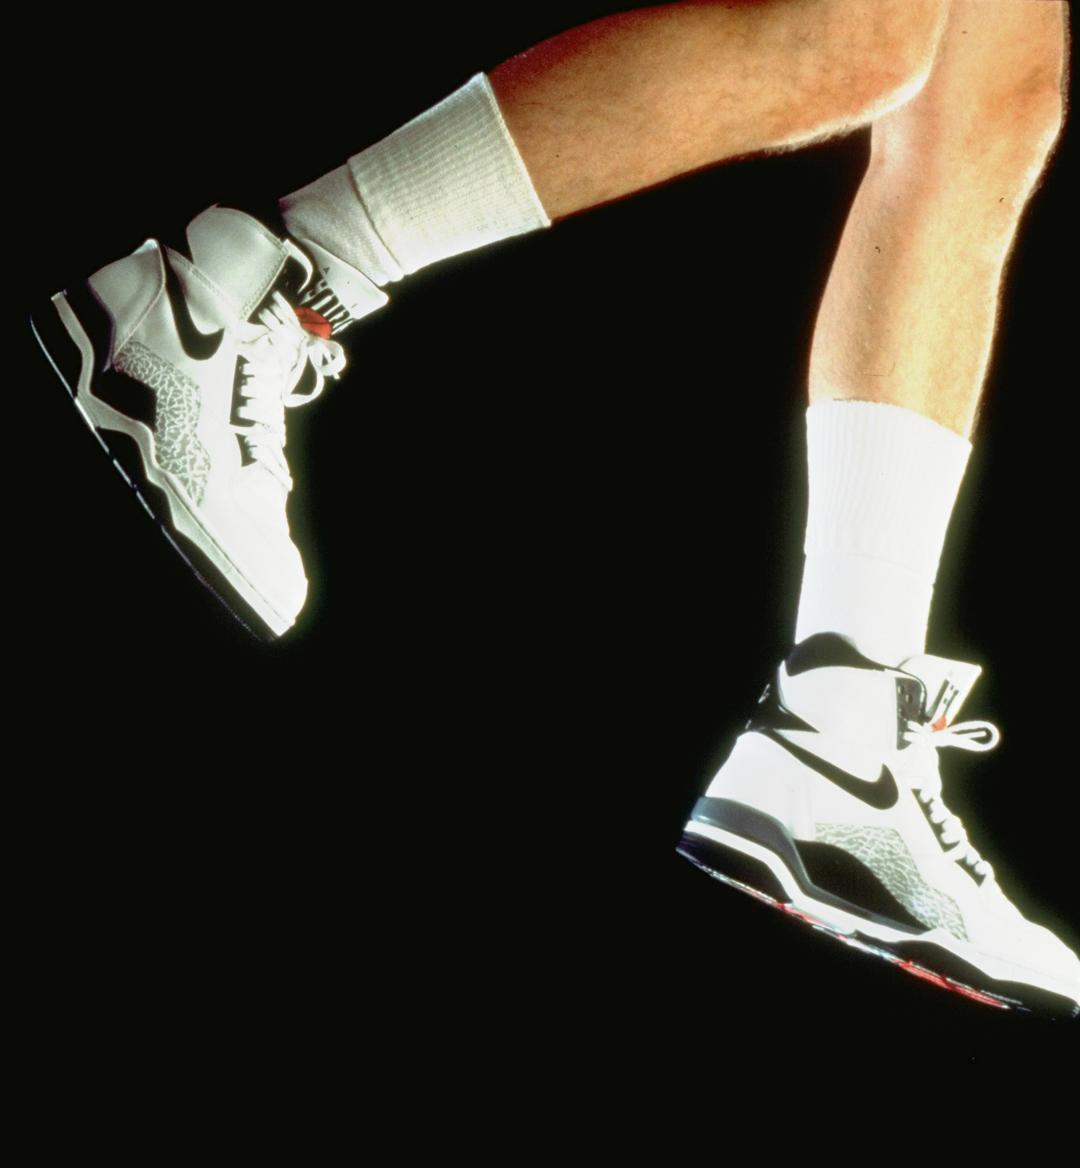 Pigmento Hacia espada  12 Old School Nike Sneakers That Deserve a Resurrection // ONE37pm